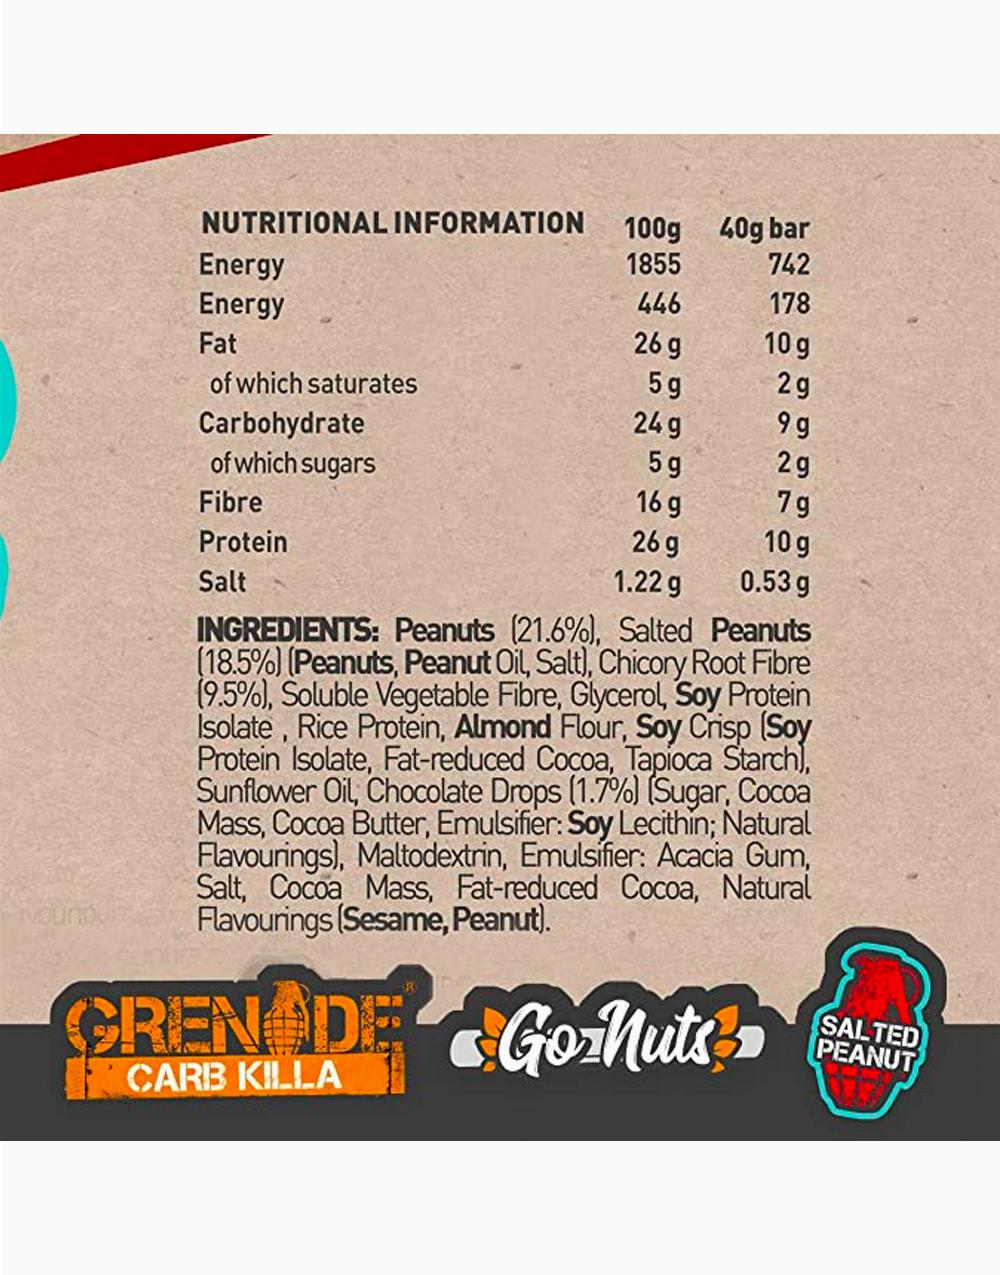 Go Nuts Vegan Nut Bar in Salted Peanut by Grenade